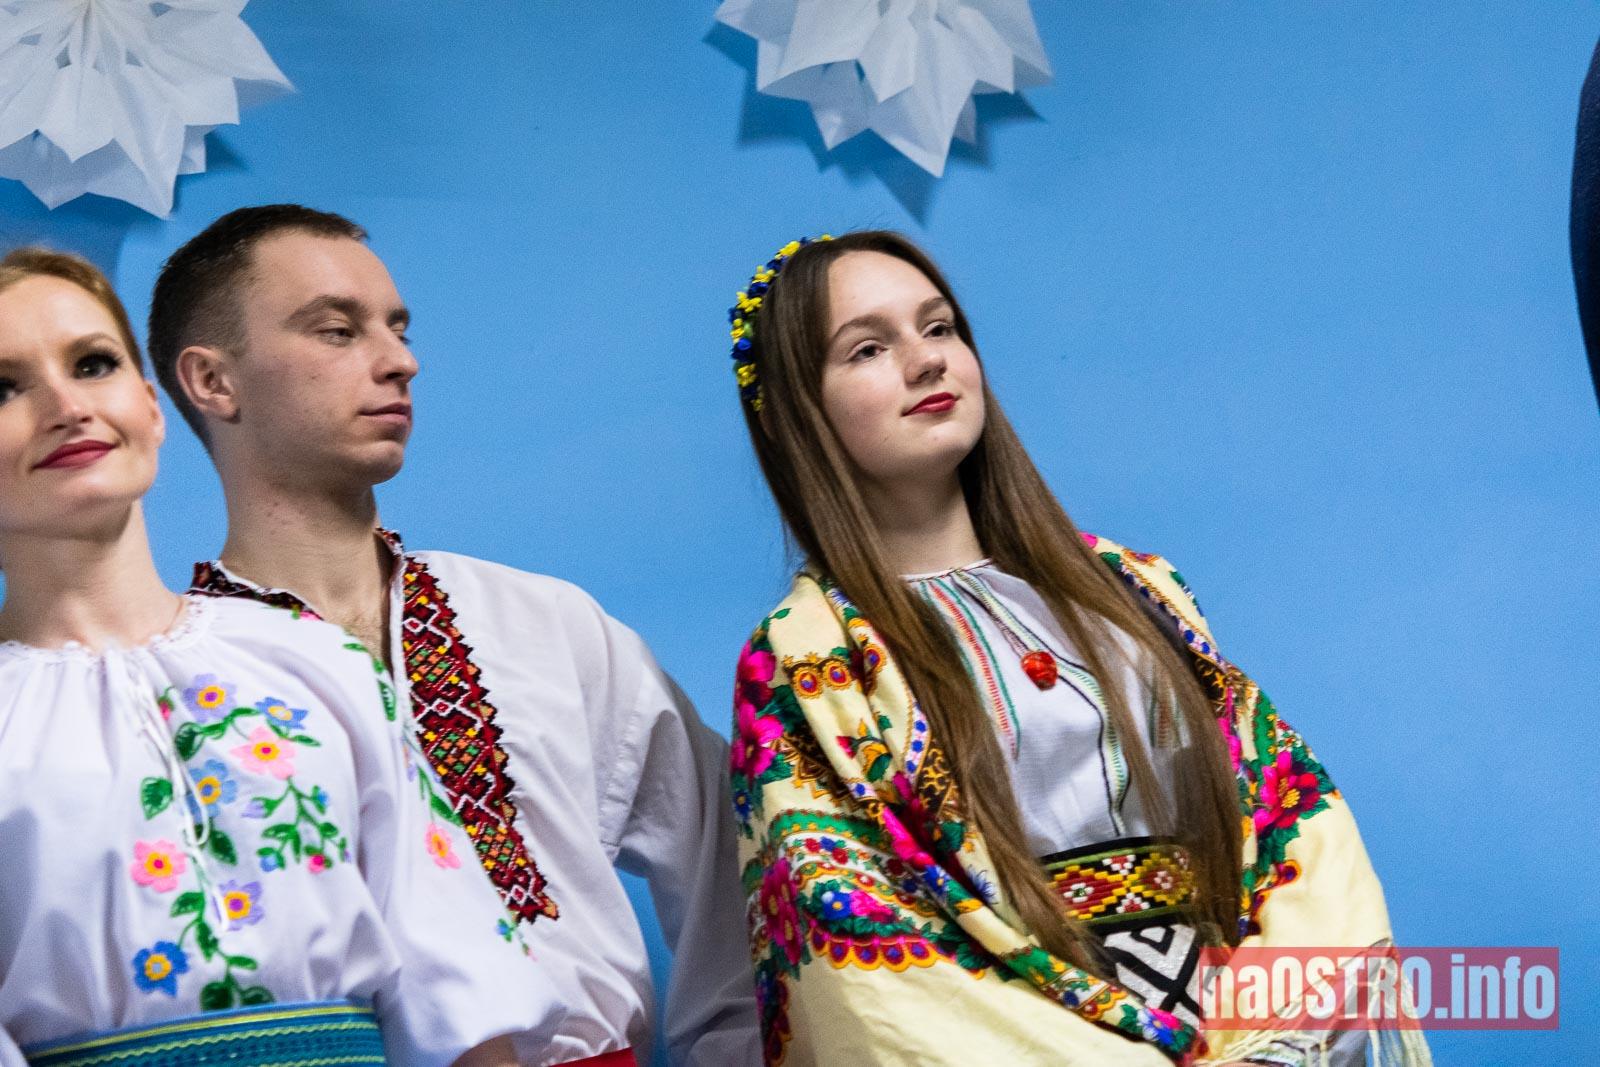 NaOSTRO Zbrucz Ukraina-10040